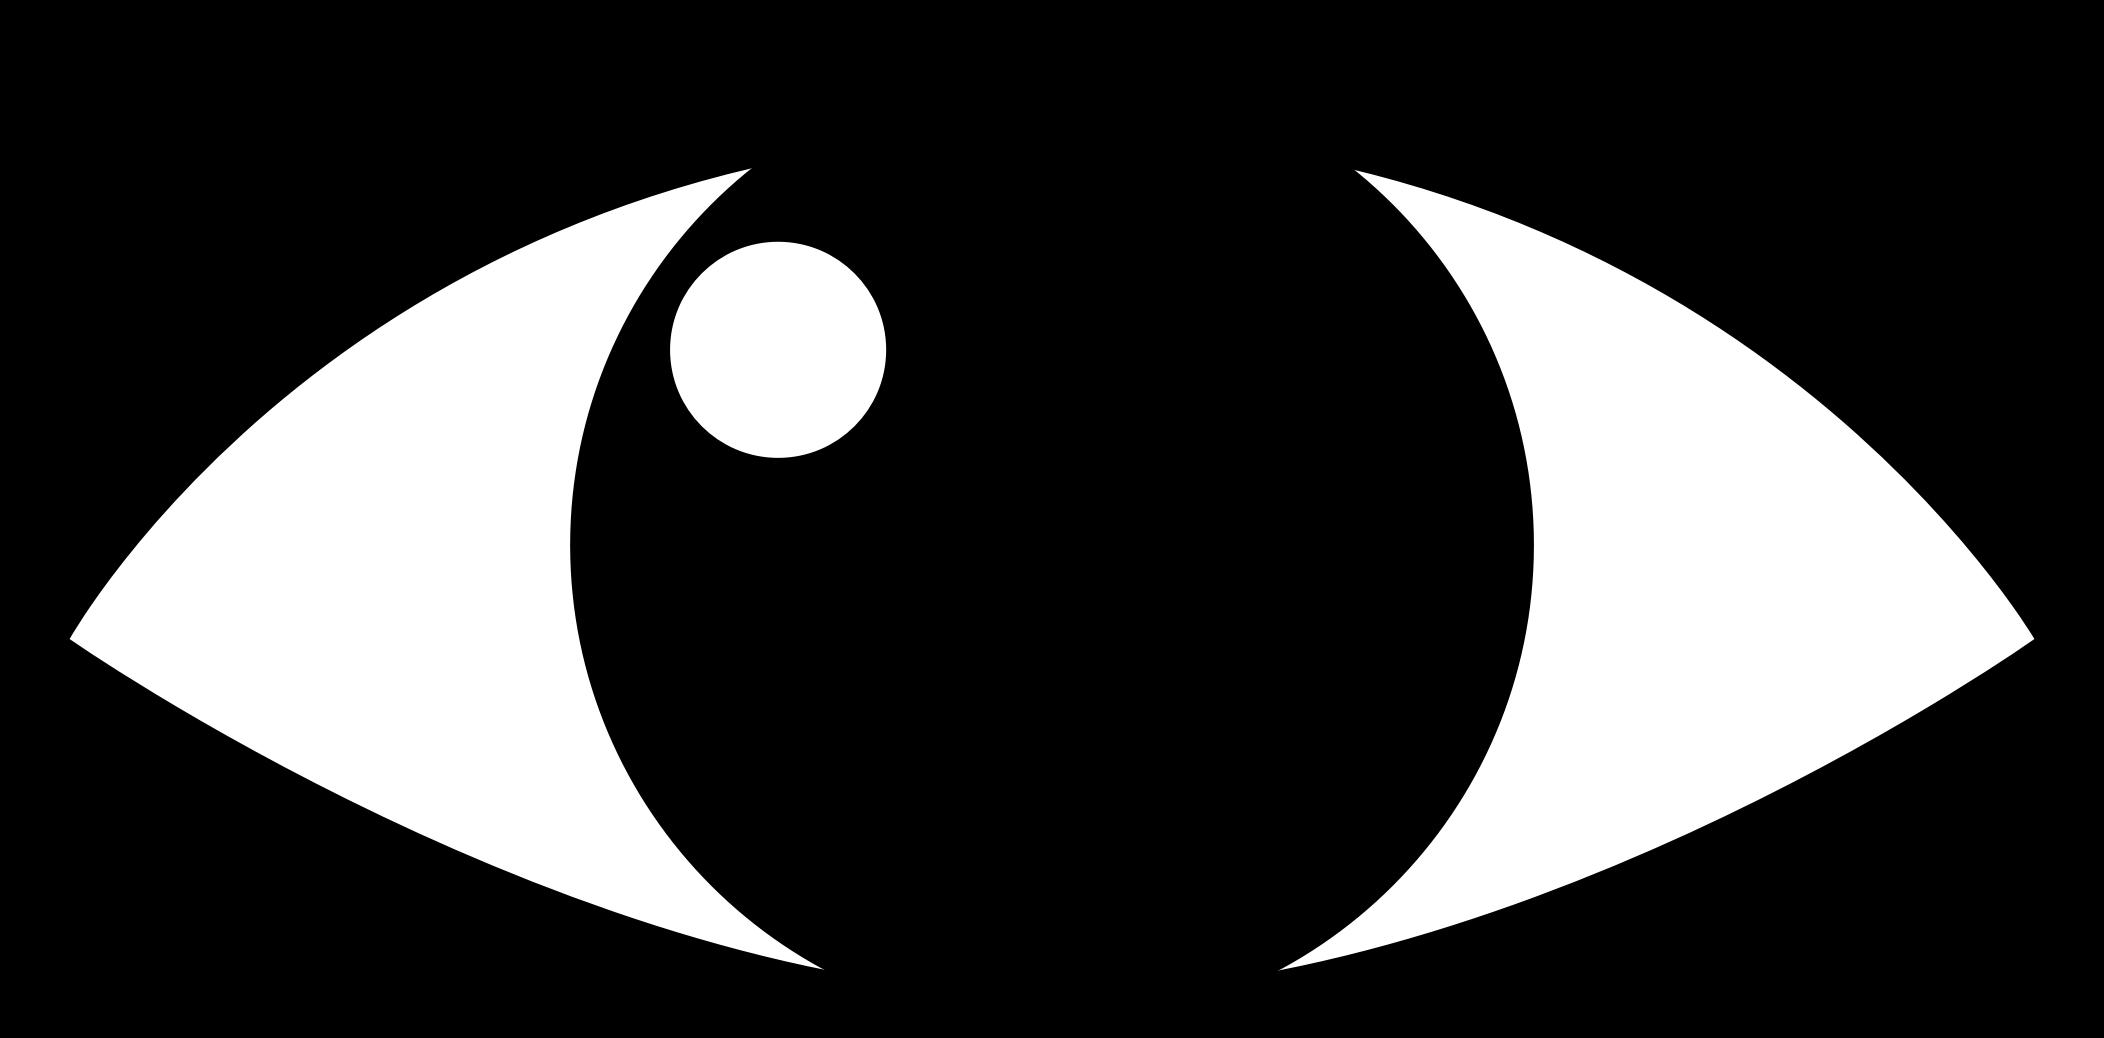 2104x1038 Eye Images Clip Art